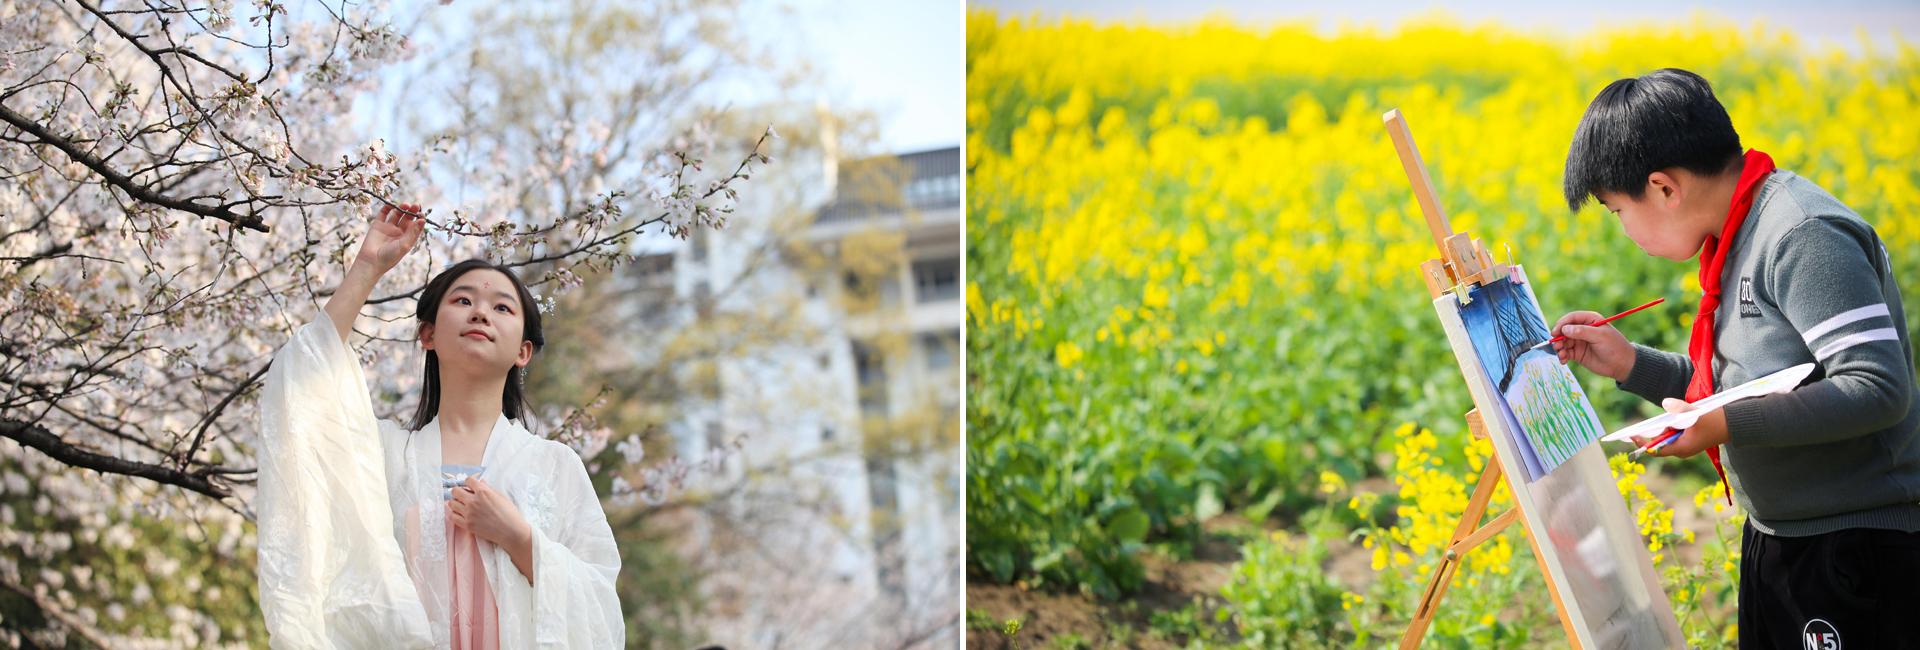 Students enjoy springtime in Jiangsu